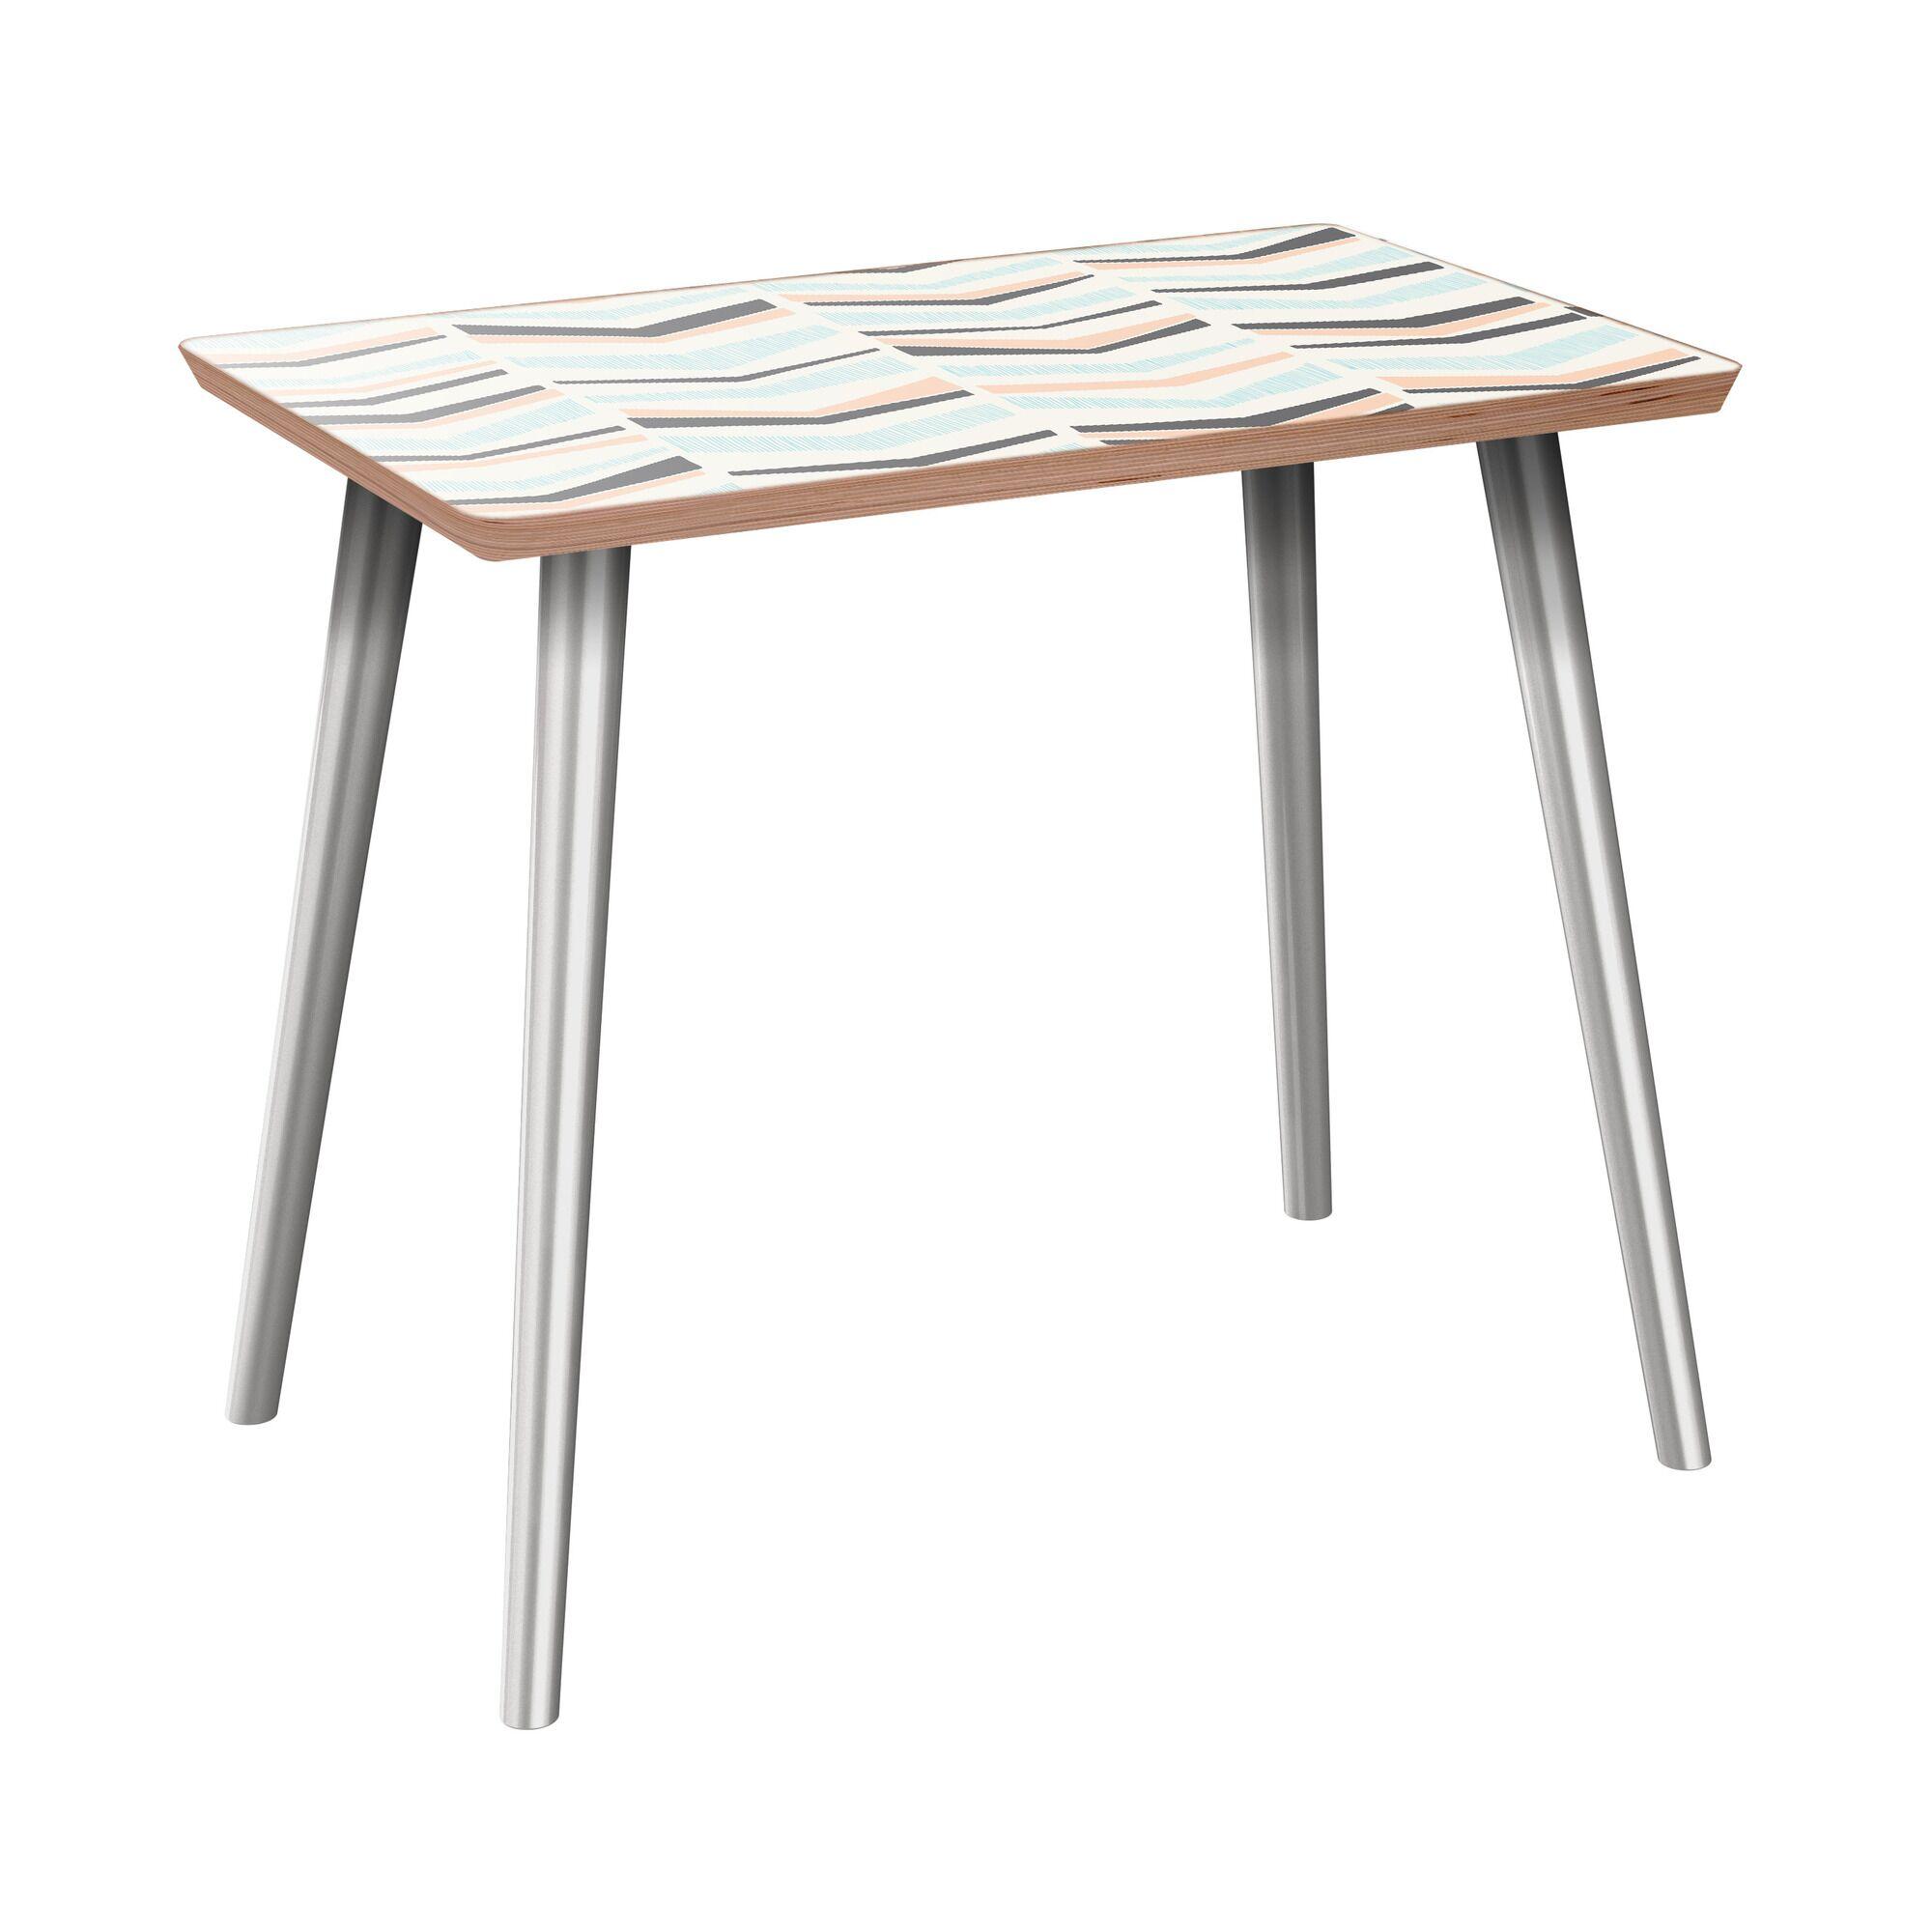 Everitt End Table Table Base Color: Chrome, Table Top Color: Walnut